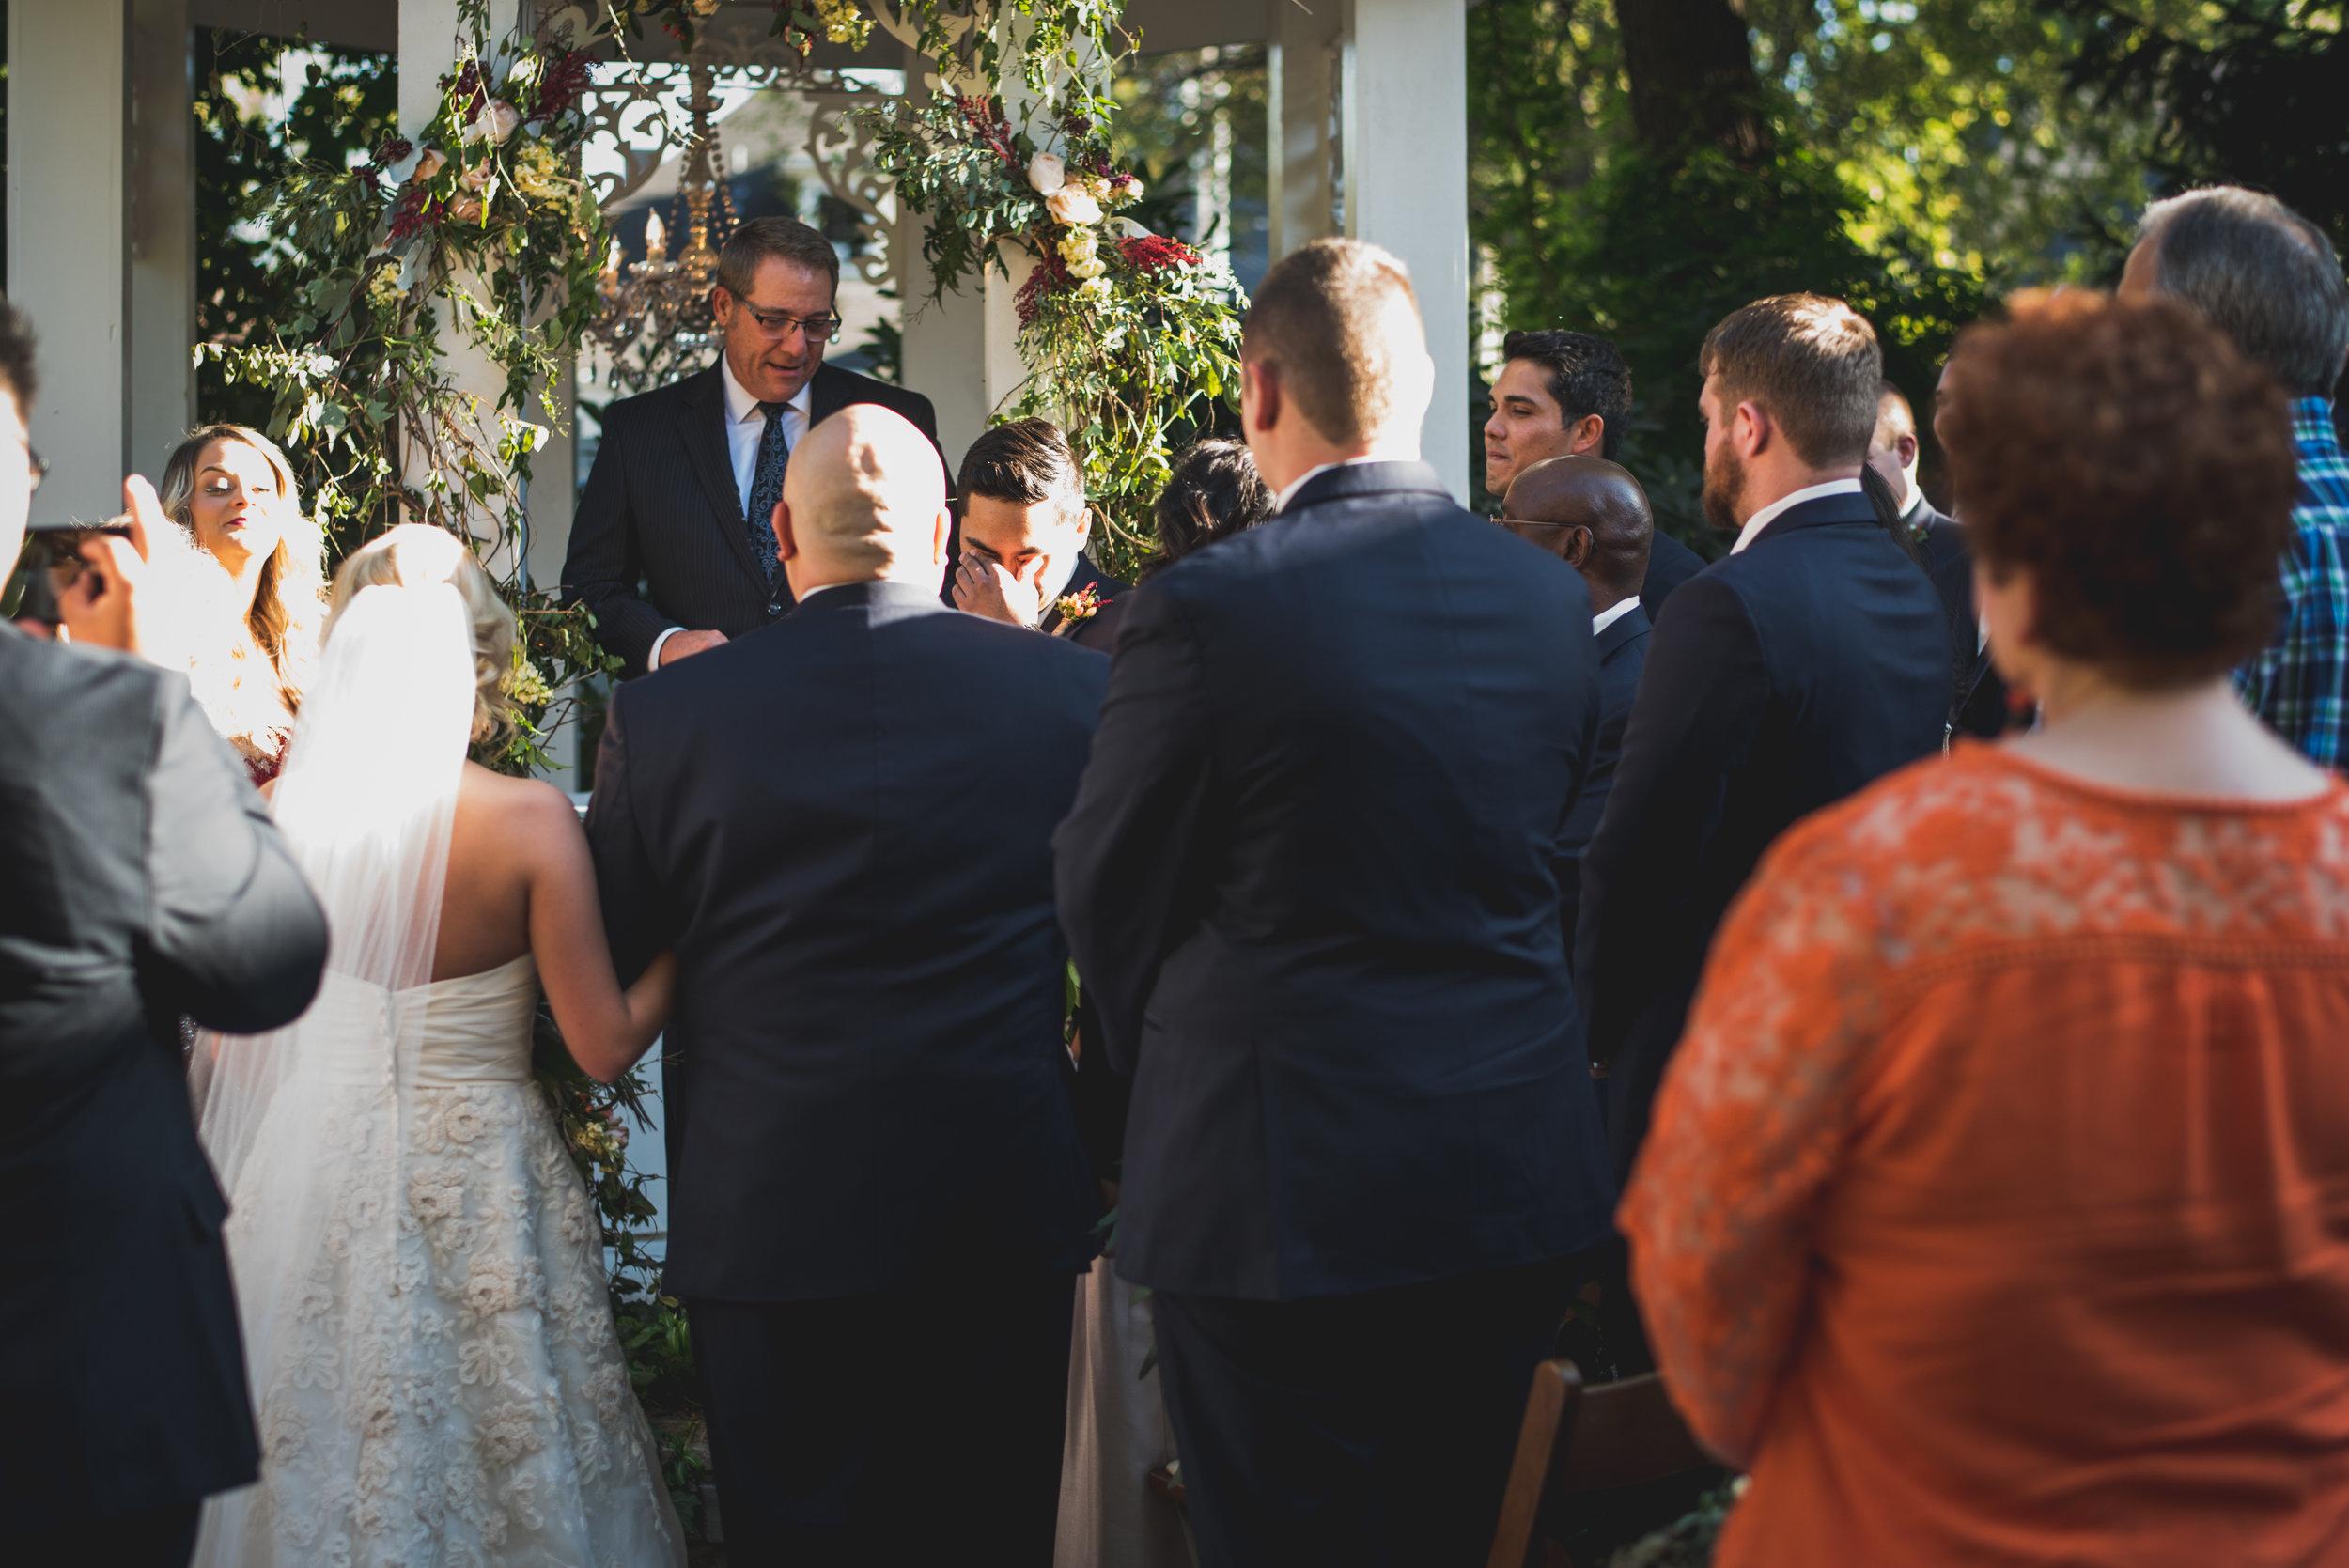 Nashville-wedding-photographers-CJ's-Off-The-Square-28.JPG